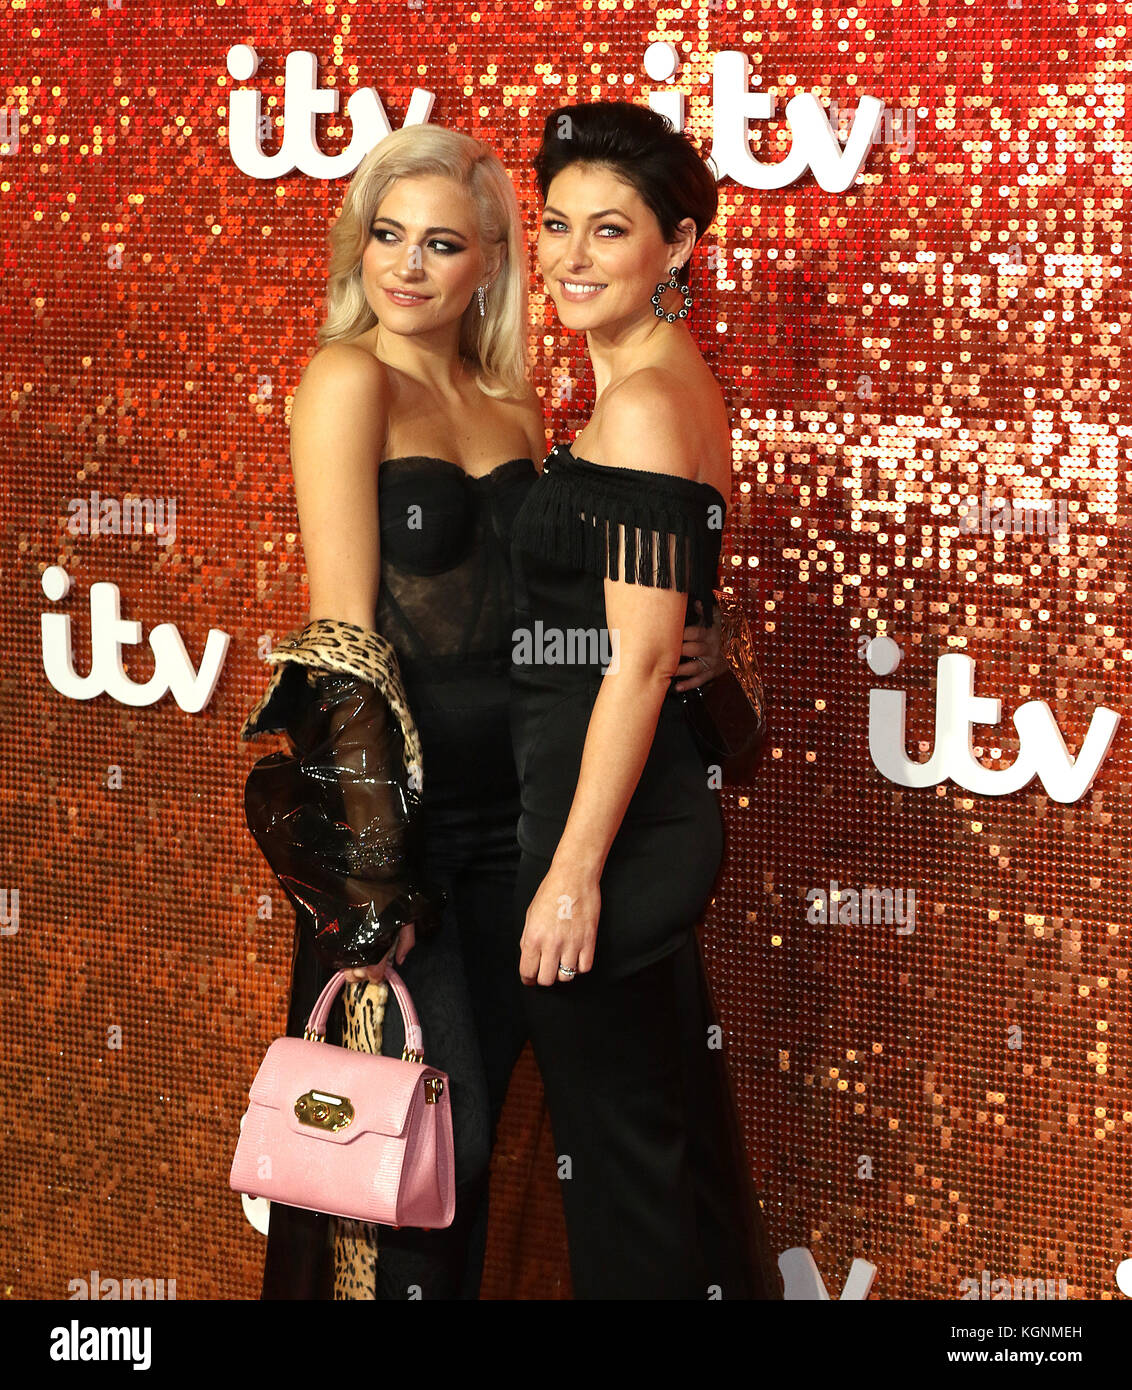 London, UK. 9th November, 2017. The Voice, Pixie Lott, Emma Willis, ITV GALA, London Palladium, London, UK. 09th - Stock Image